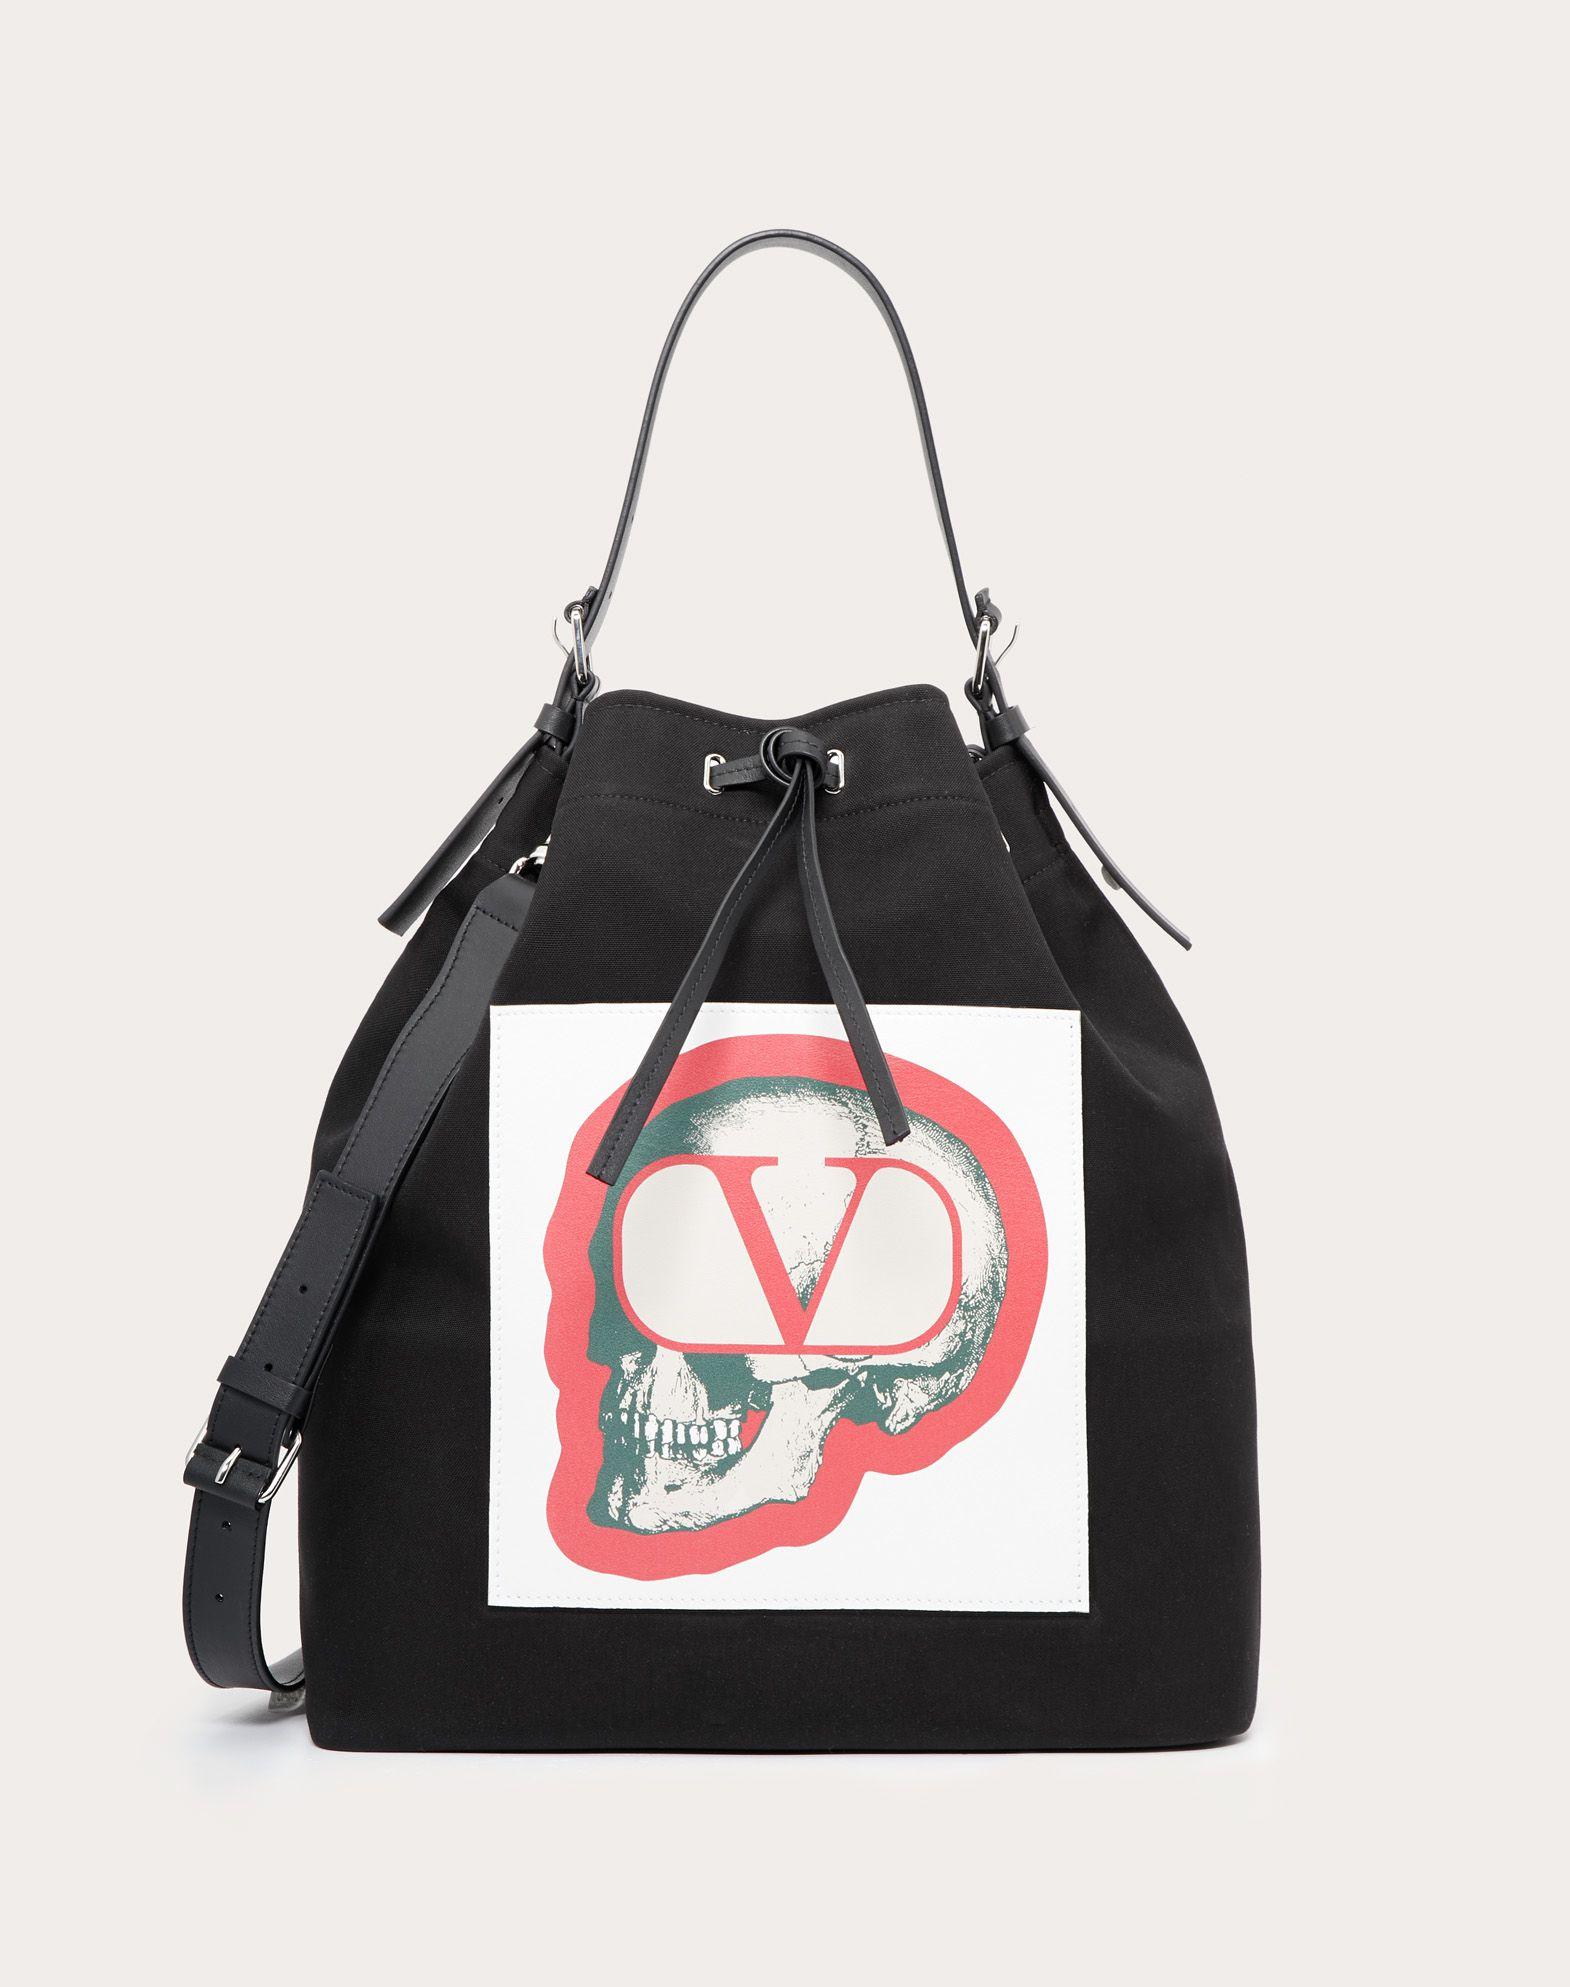 Valentino Garavani Undercover bucket bag